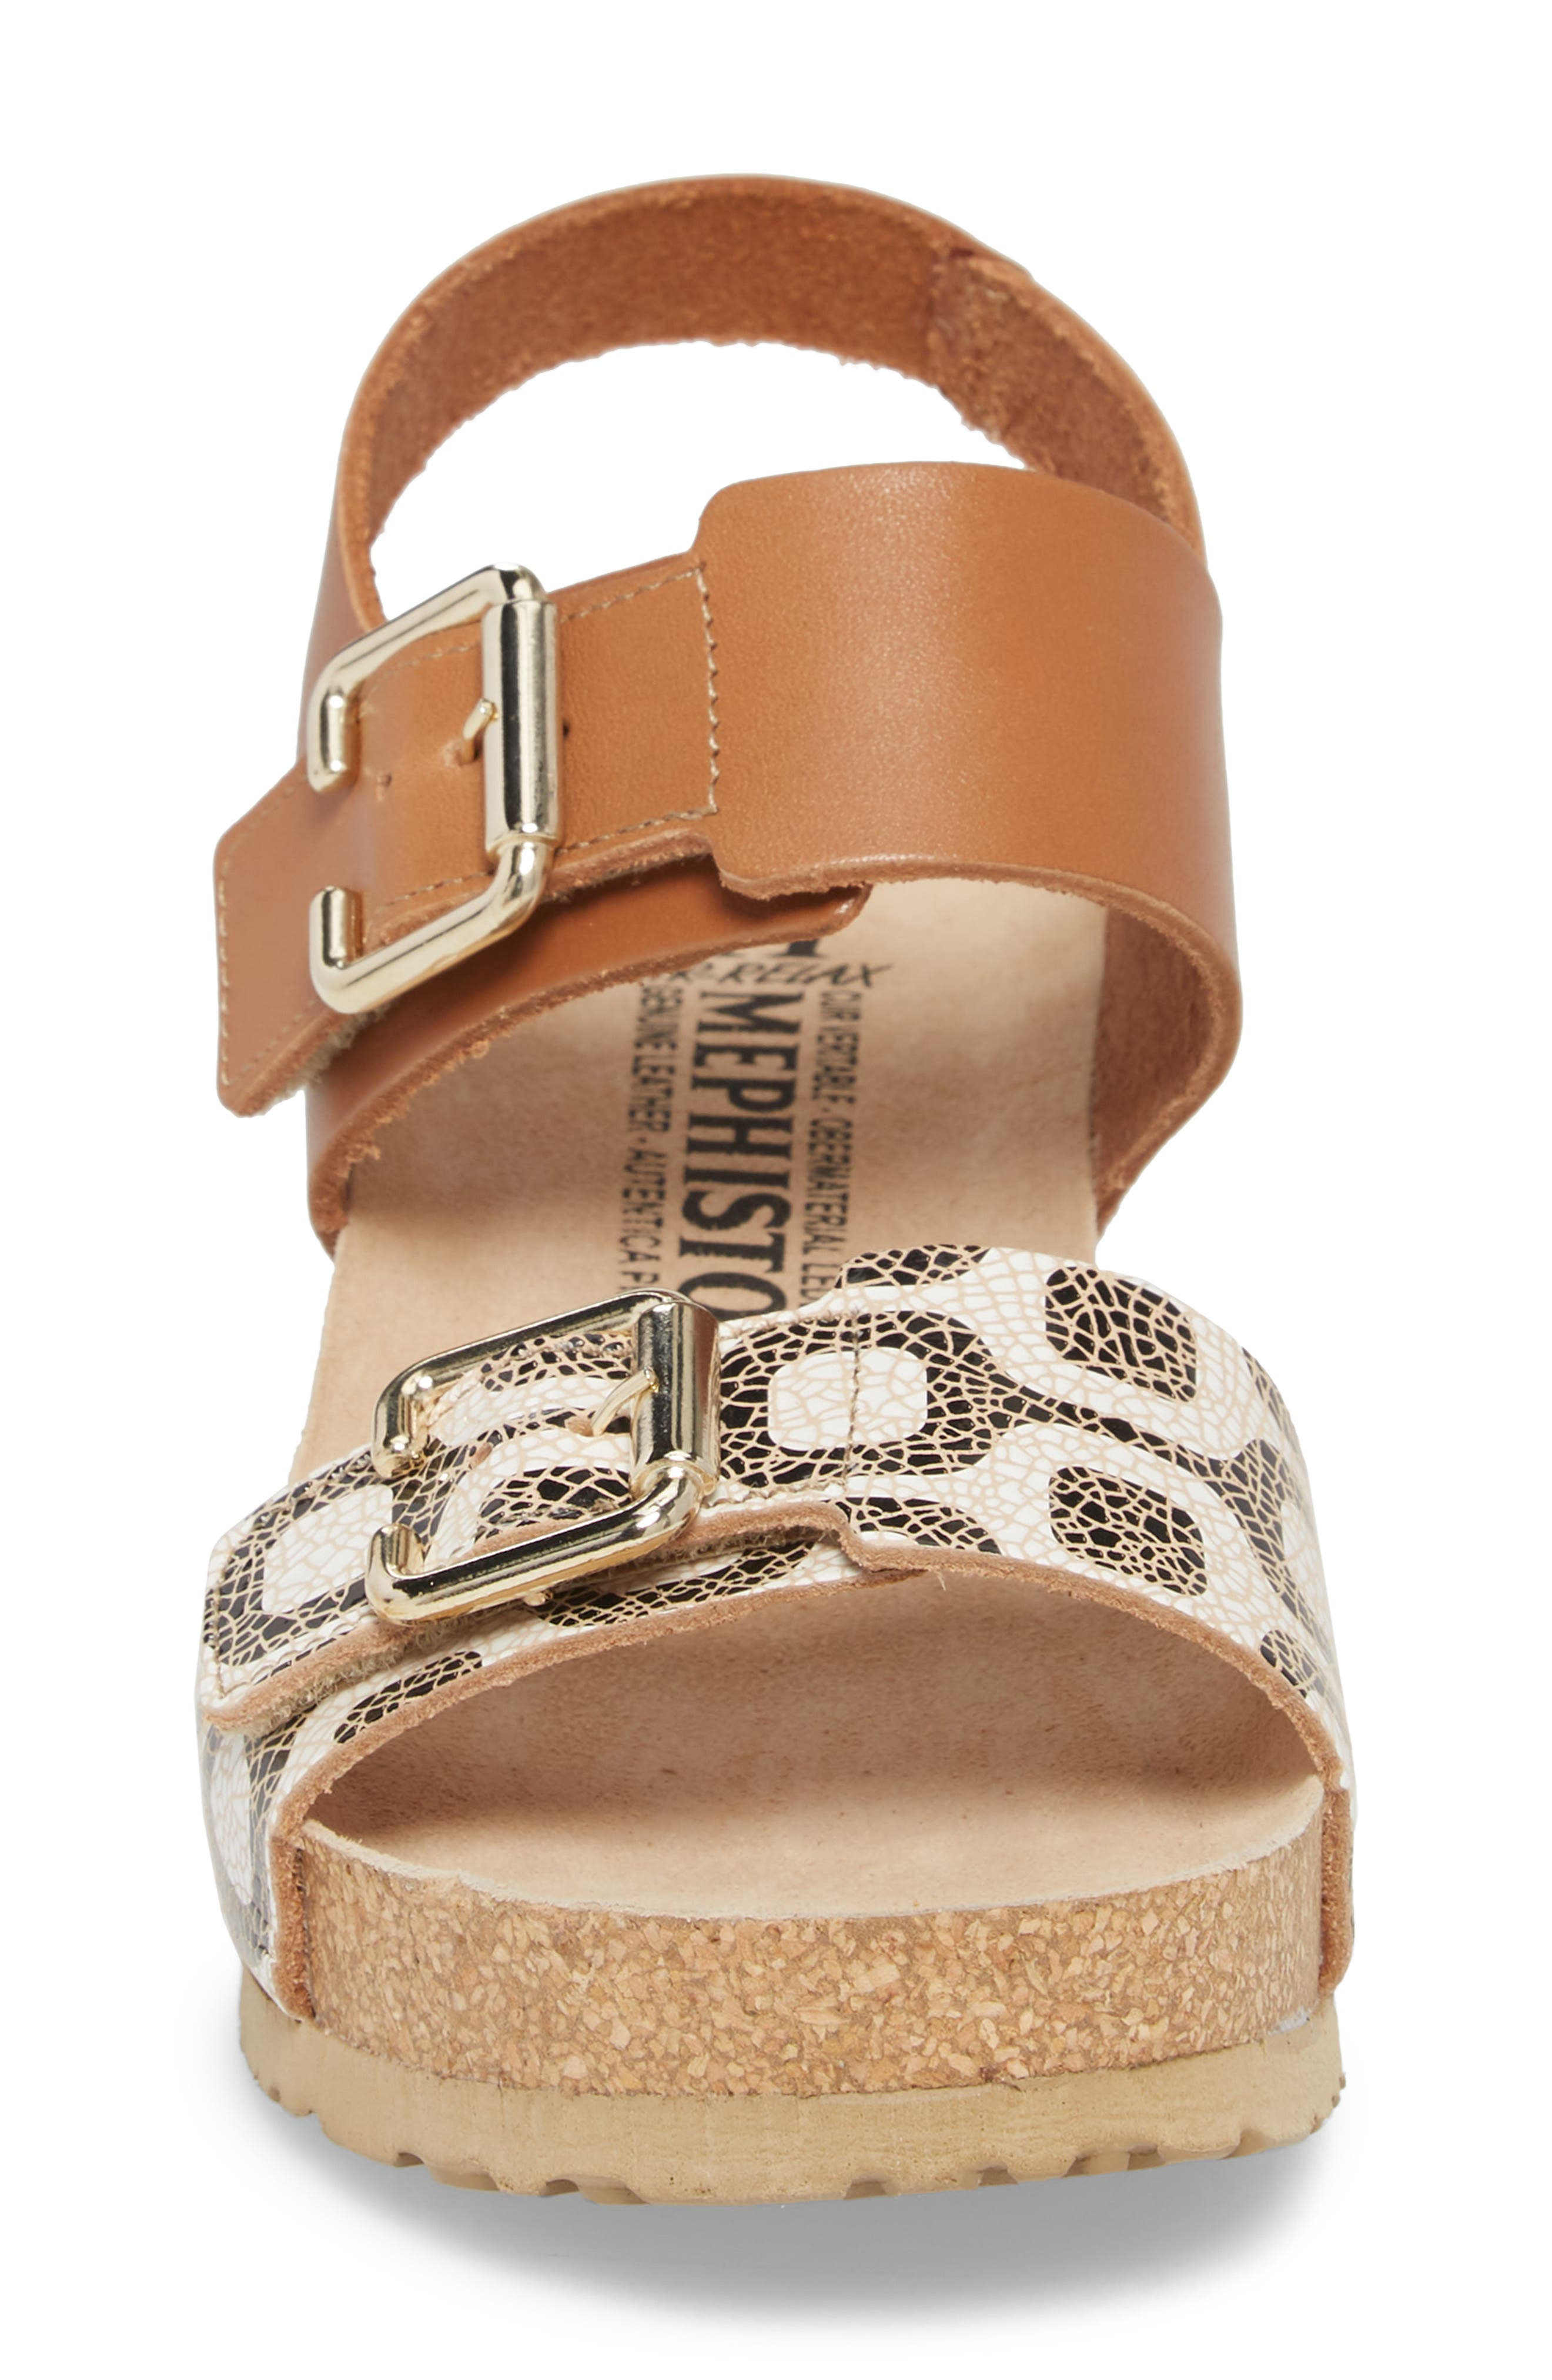 Lissandra Platform Wedge Sandal,                             Alternate thumbnail 4, color,                             Camel